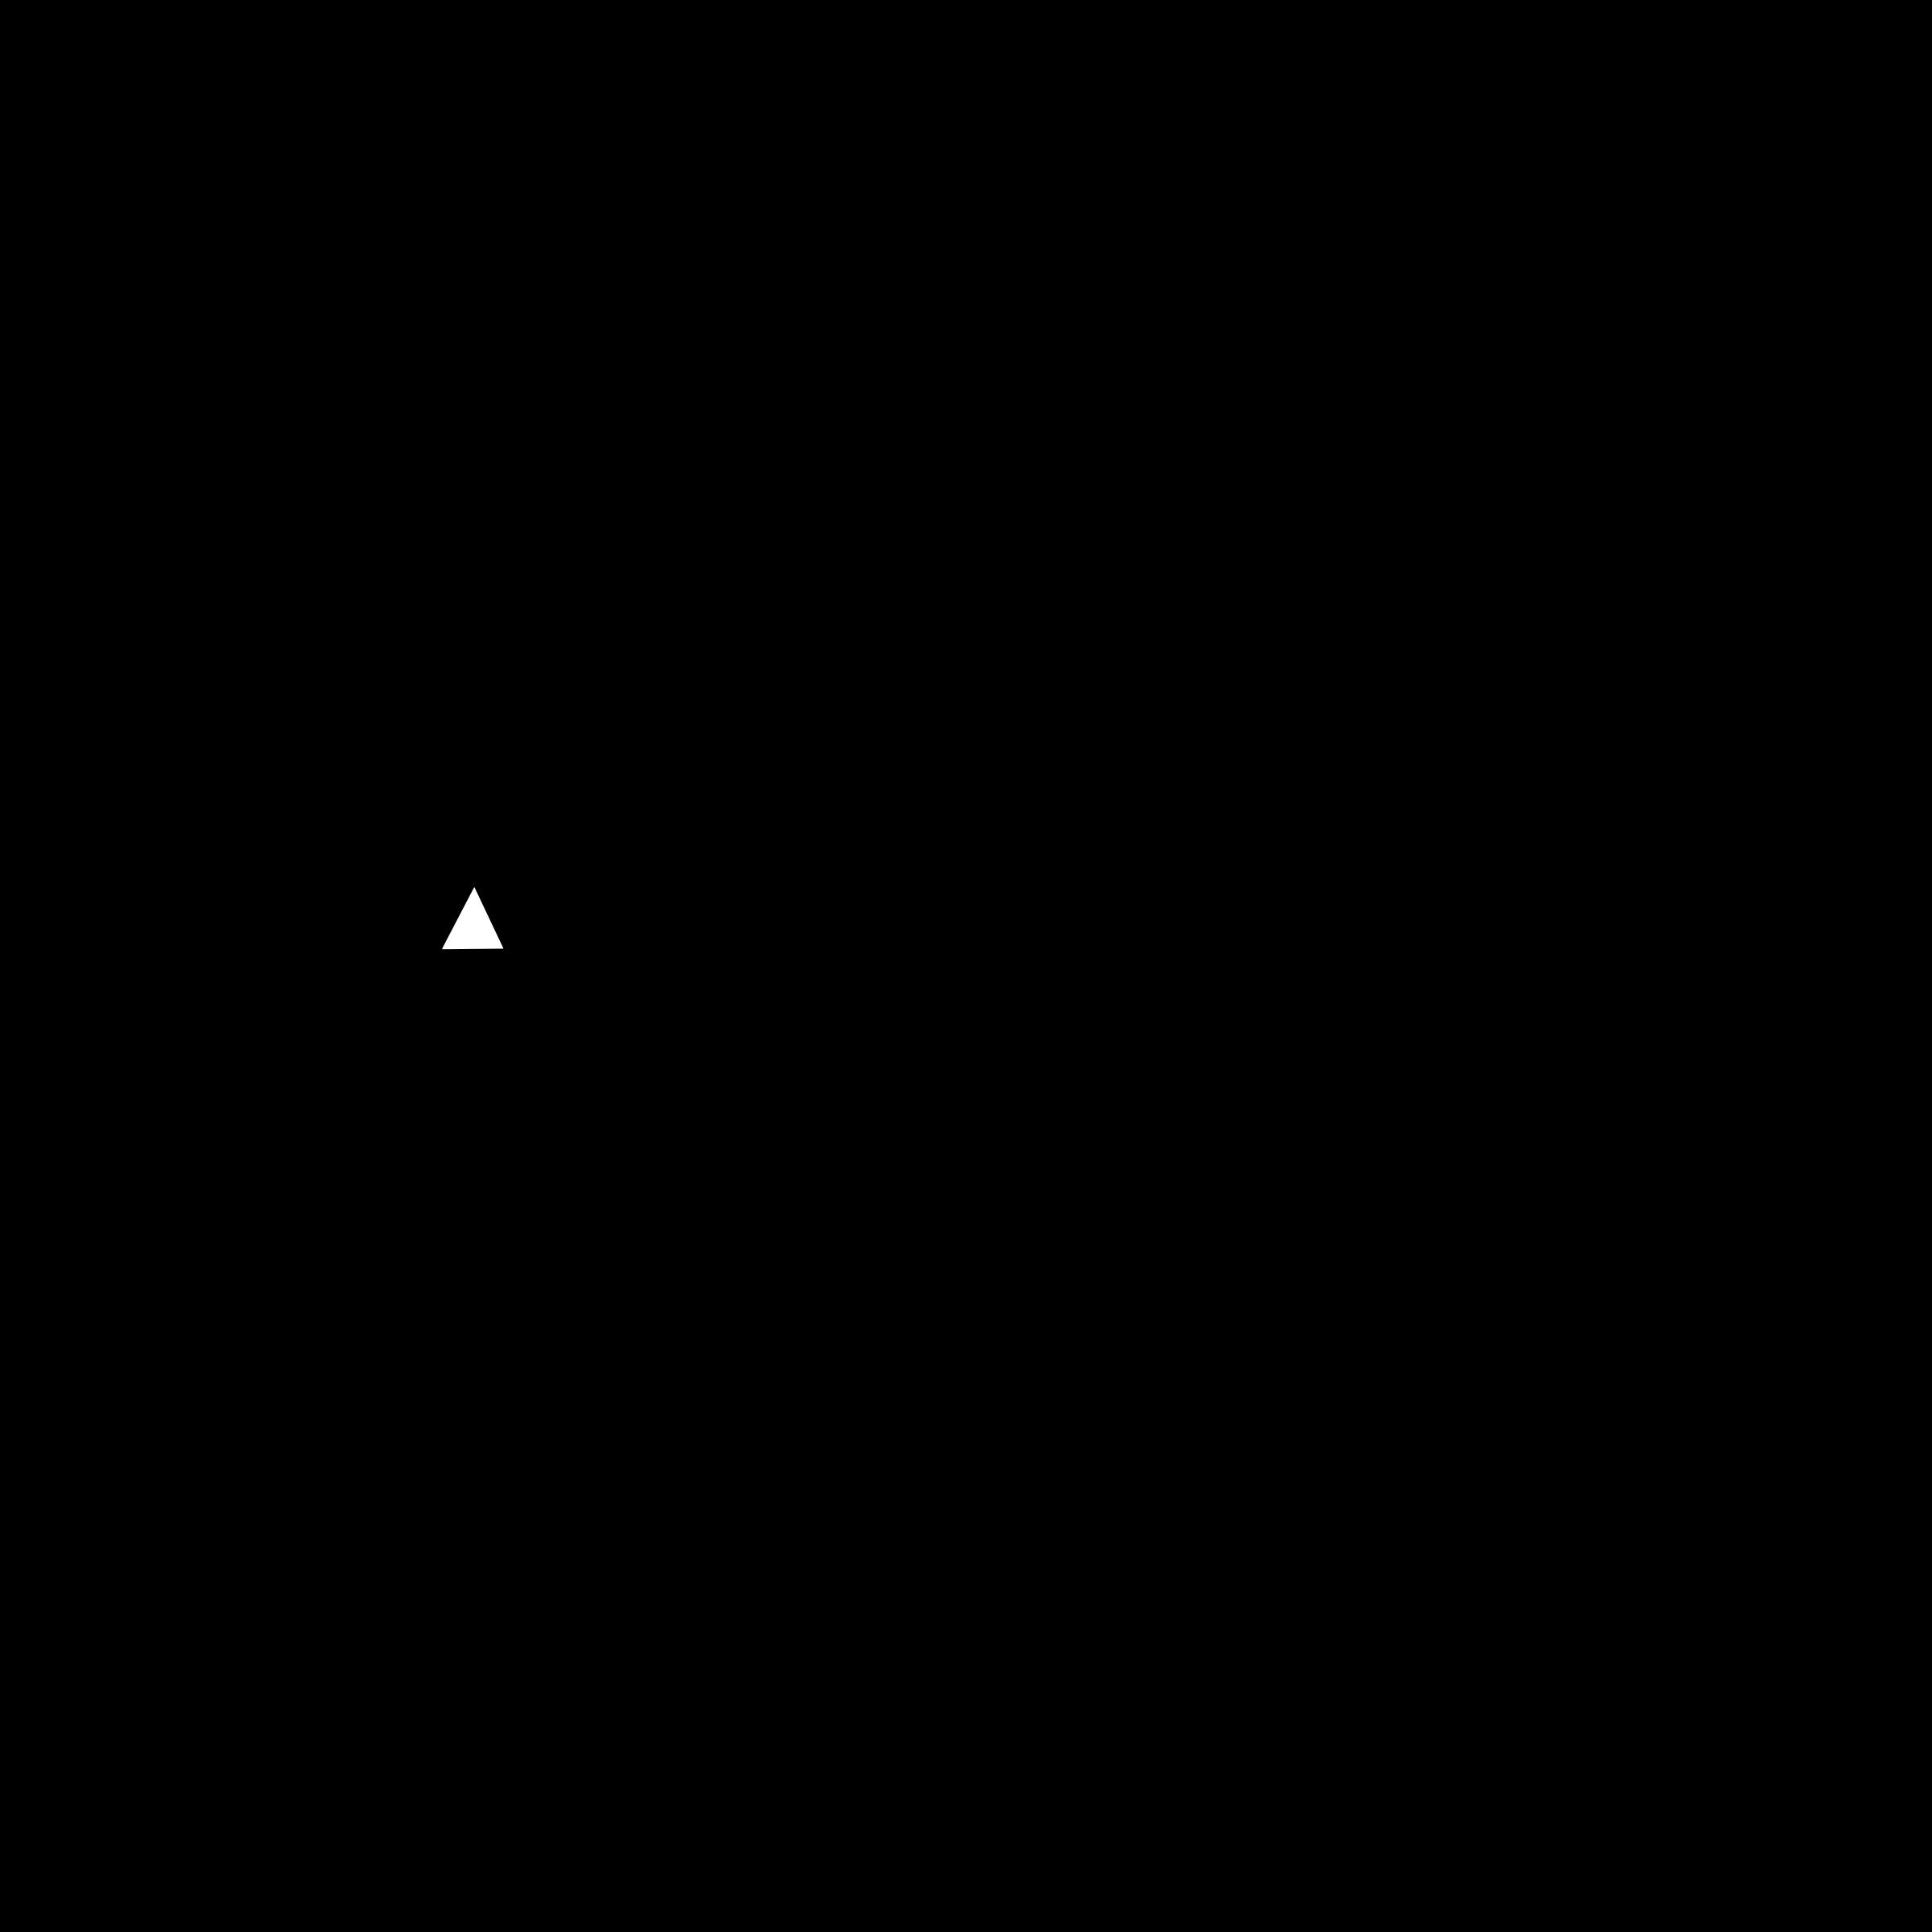 Black Evanescence Logo Topsimages